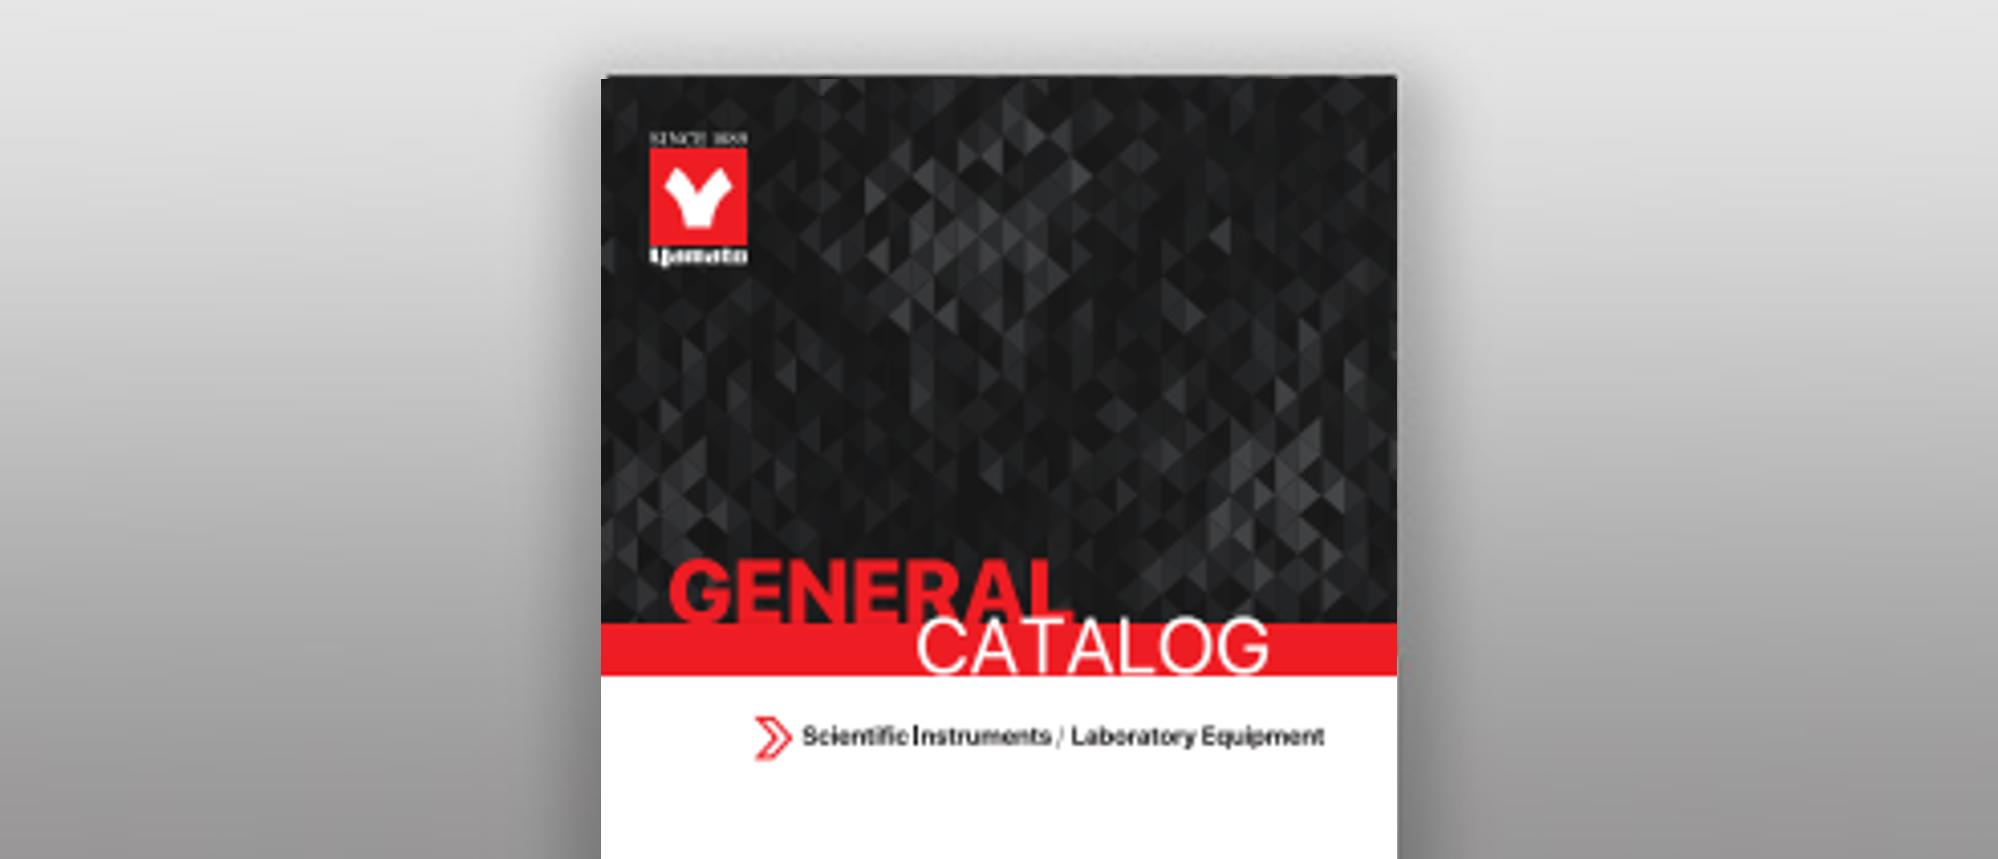 Yamato General Catalog